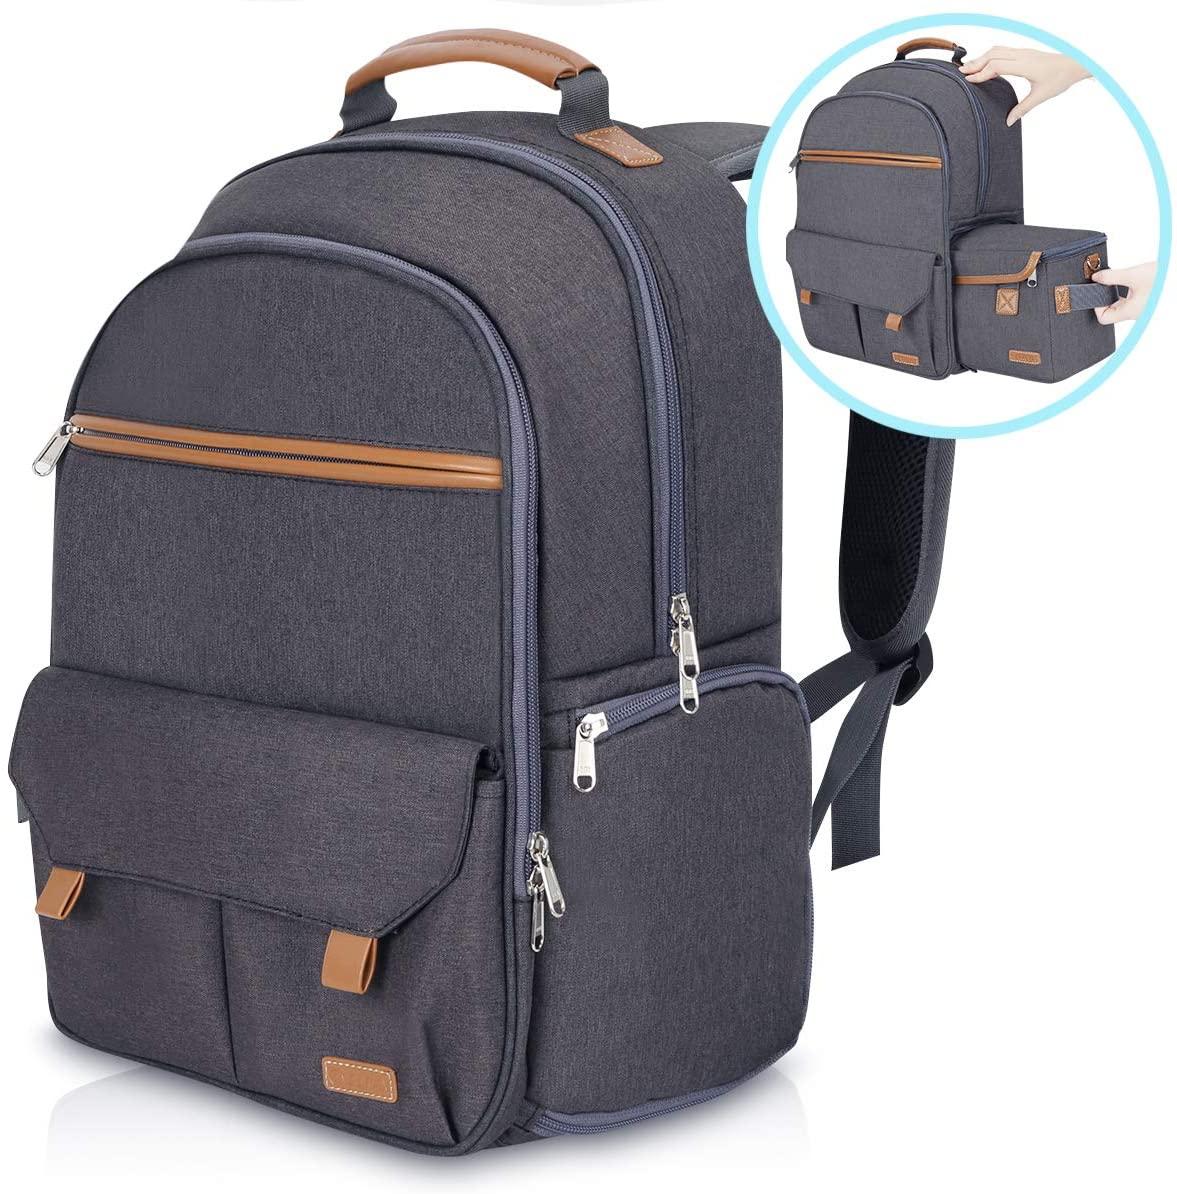 Endurax Waterproof Camera Backpack for Women and Men Fits 15.6